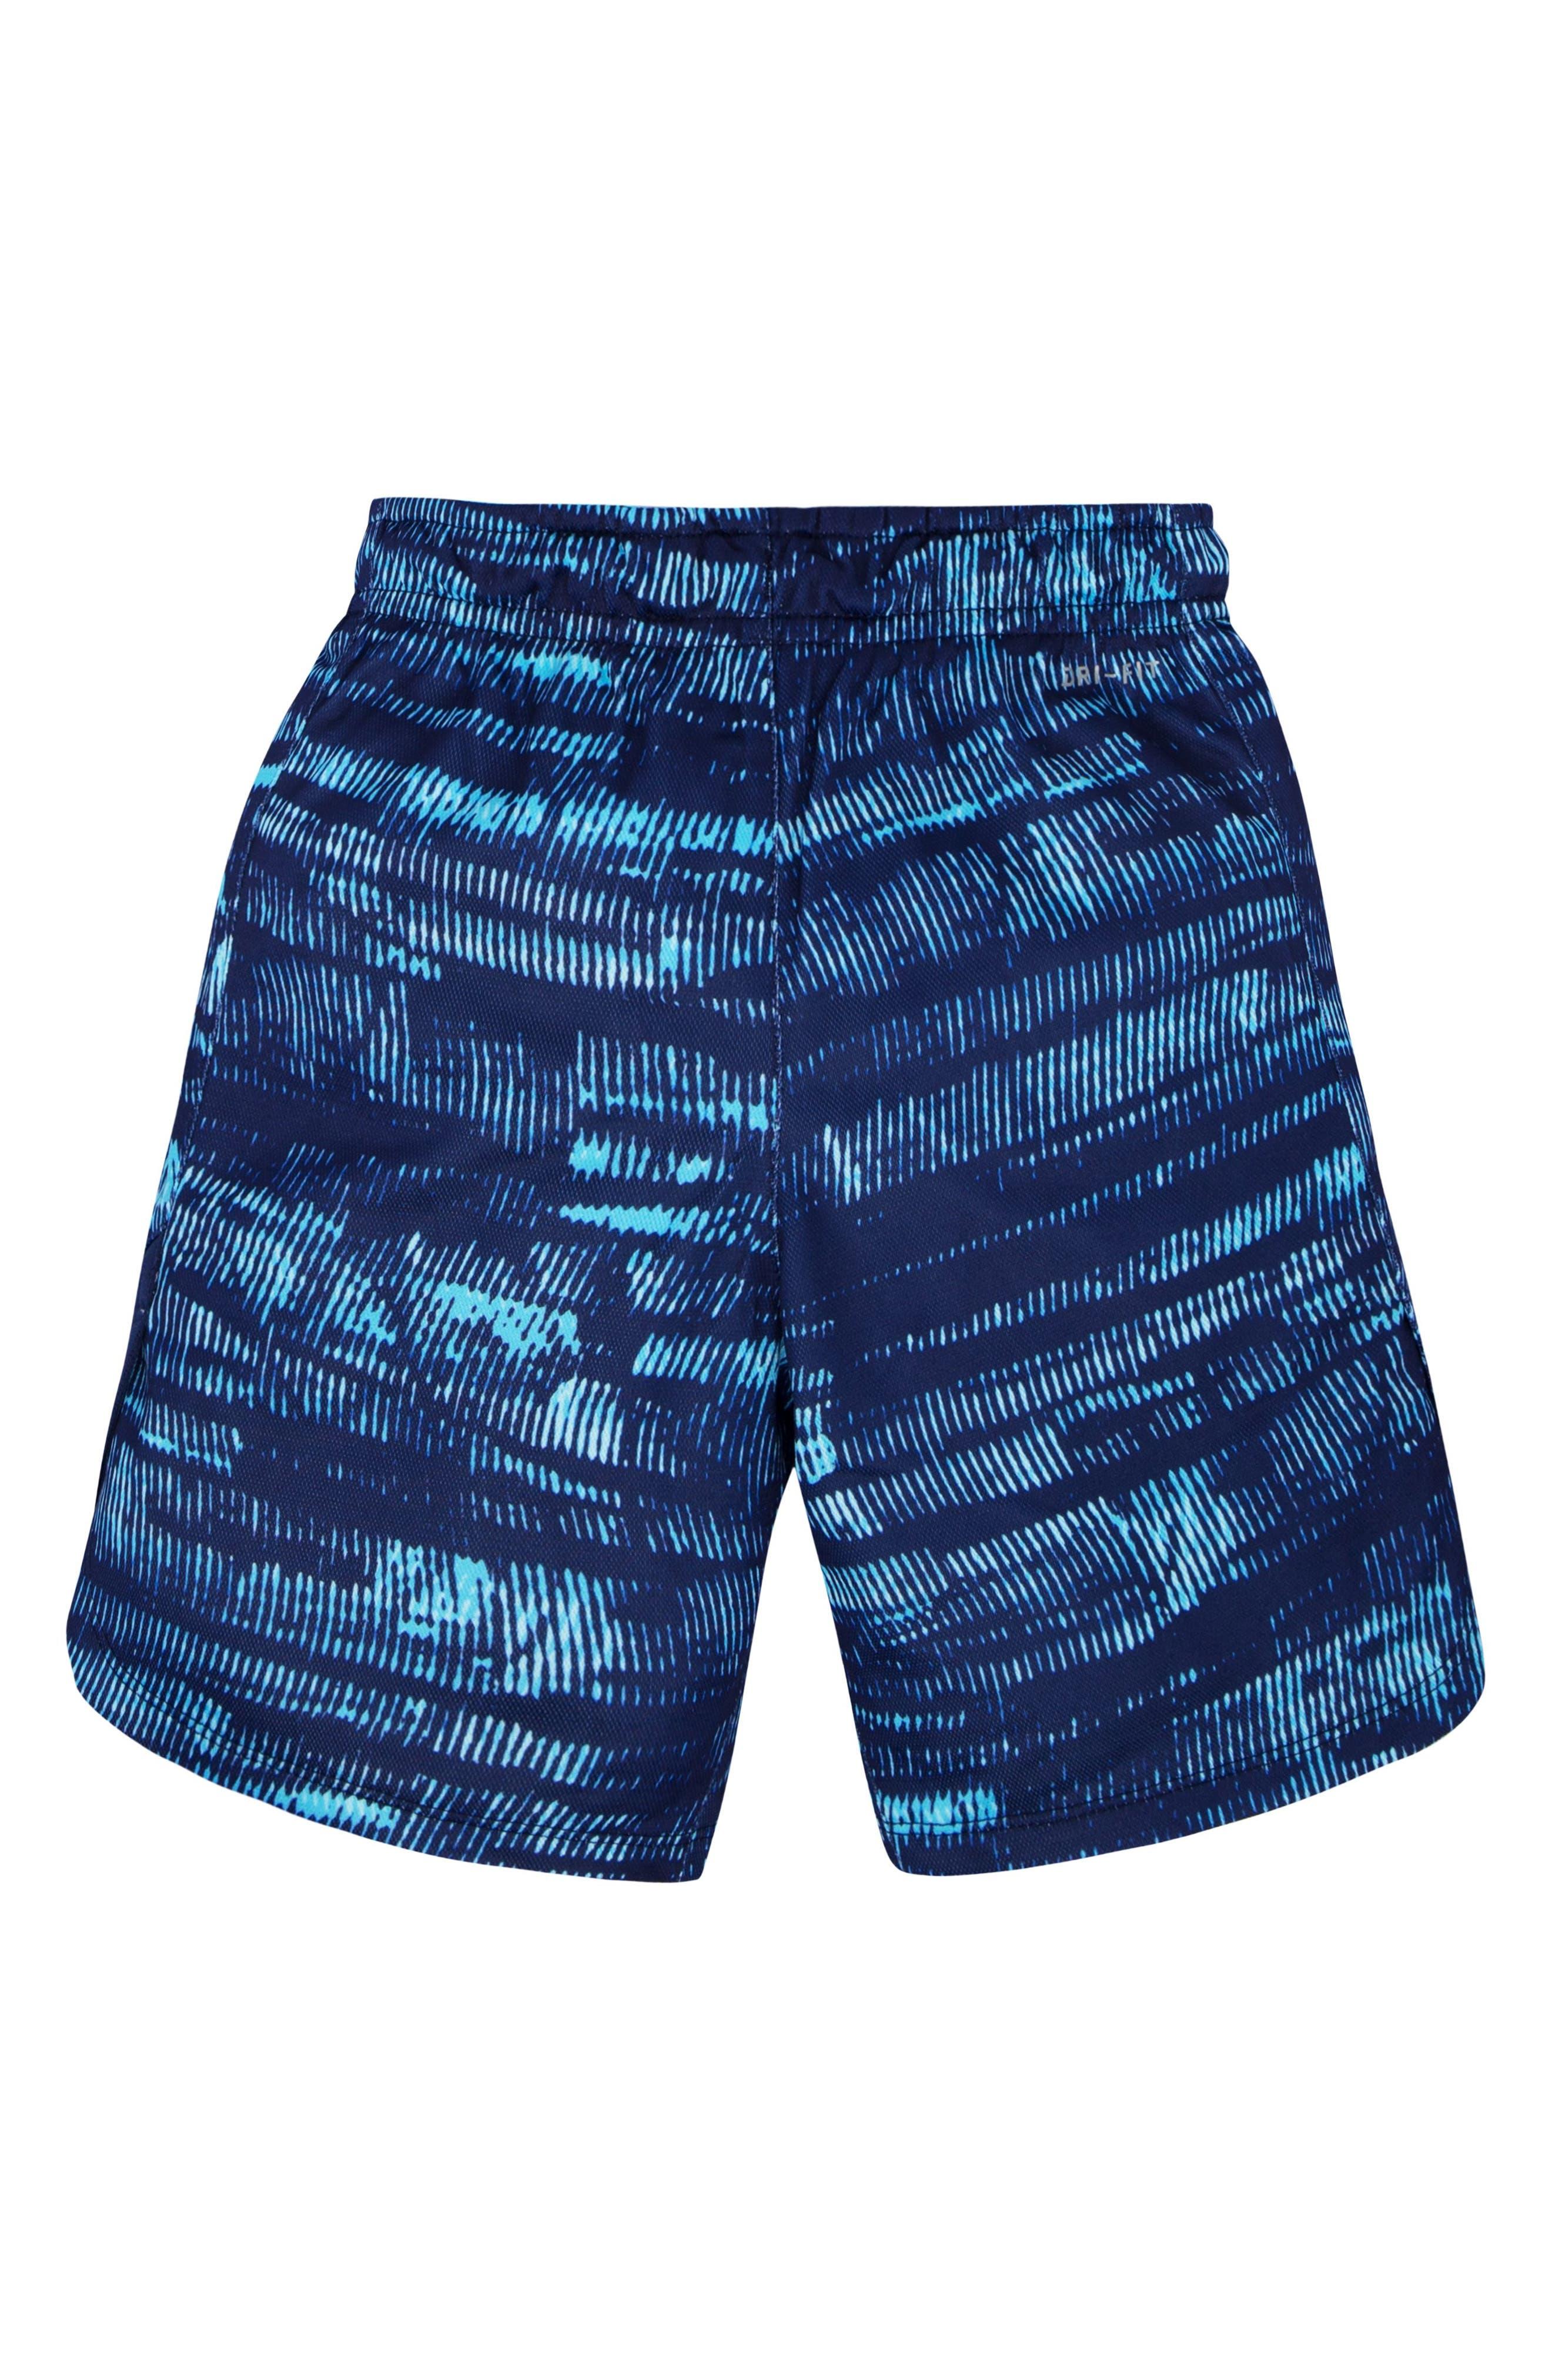 Dri-FIT Shorts,                             Main thumbnail 1, color,                             402